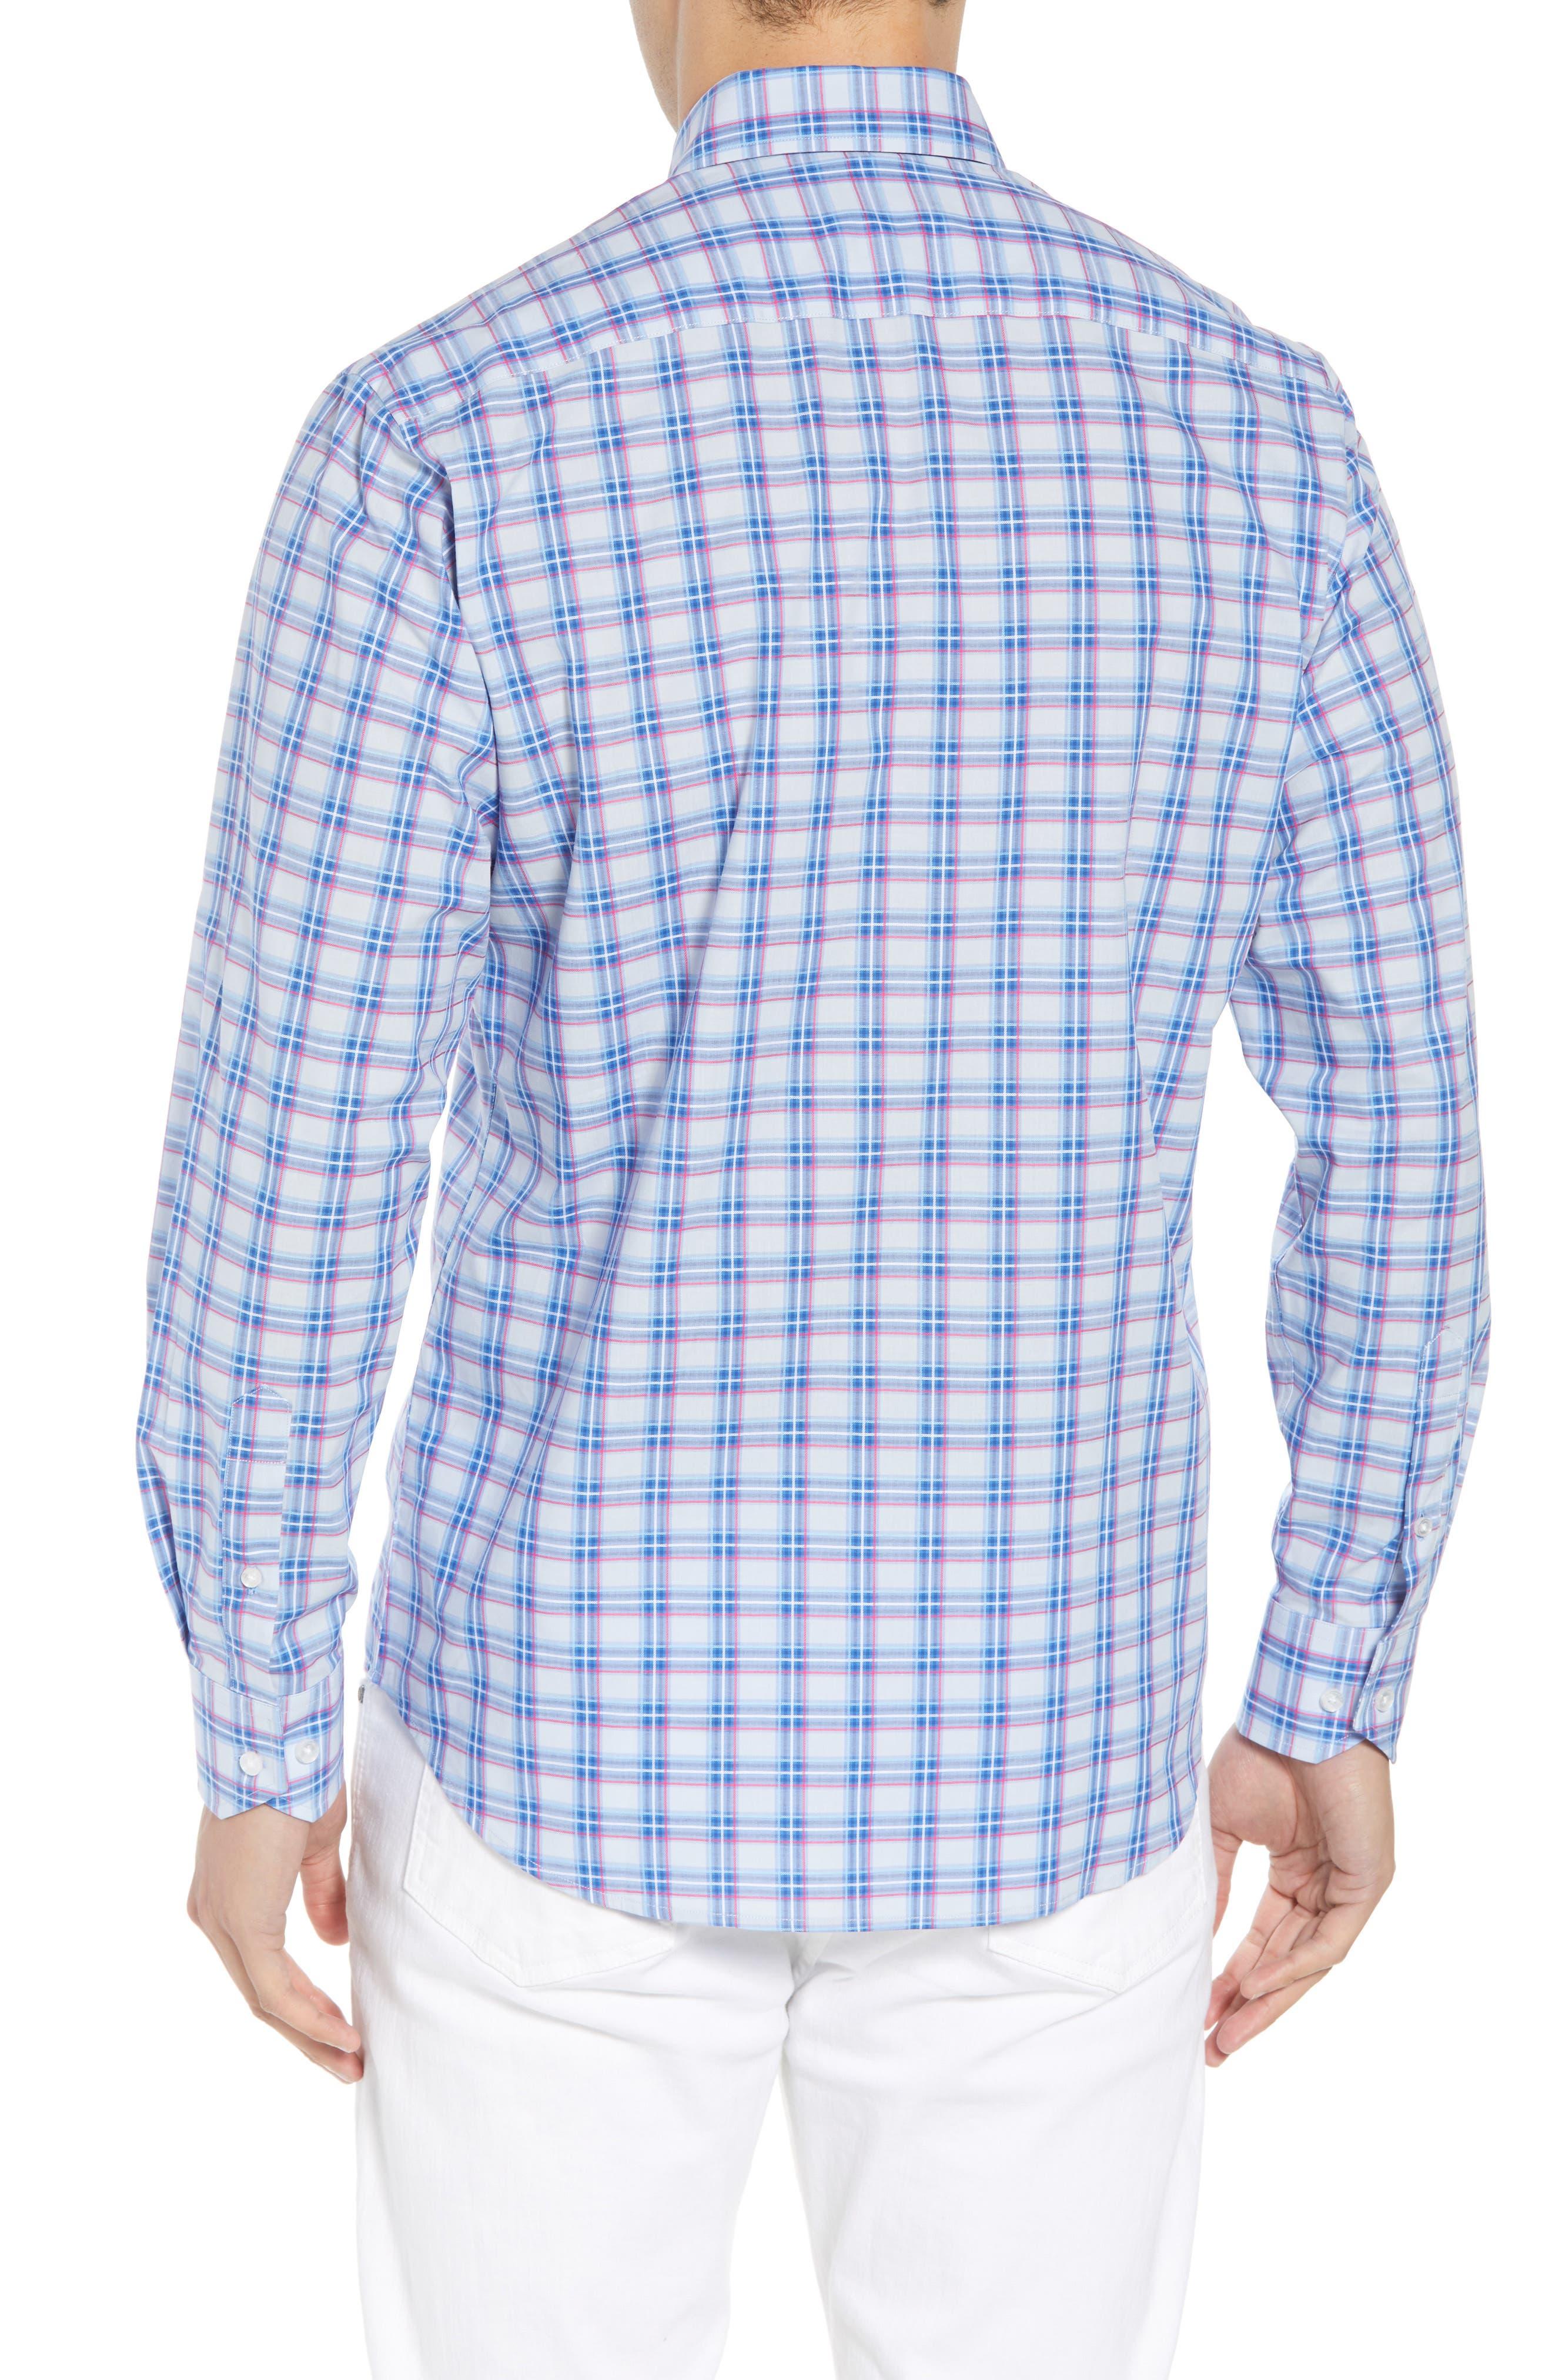 Alvaro Regular Fit Plaid Sport Shirt,                             Alternate thumbnail 3, color,                             Light Blue